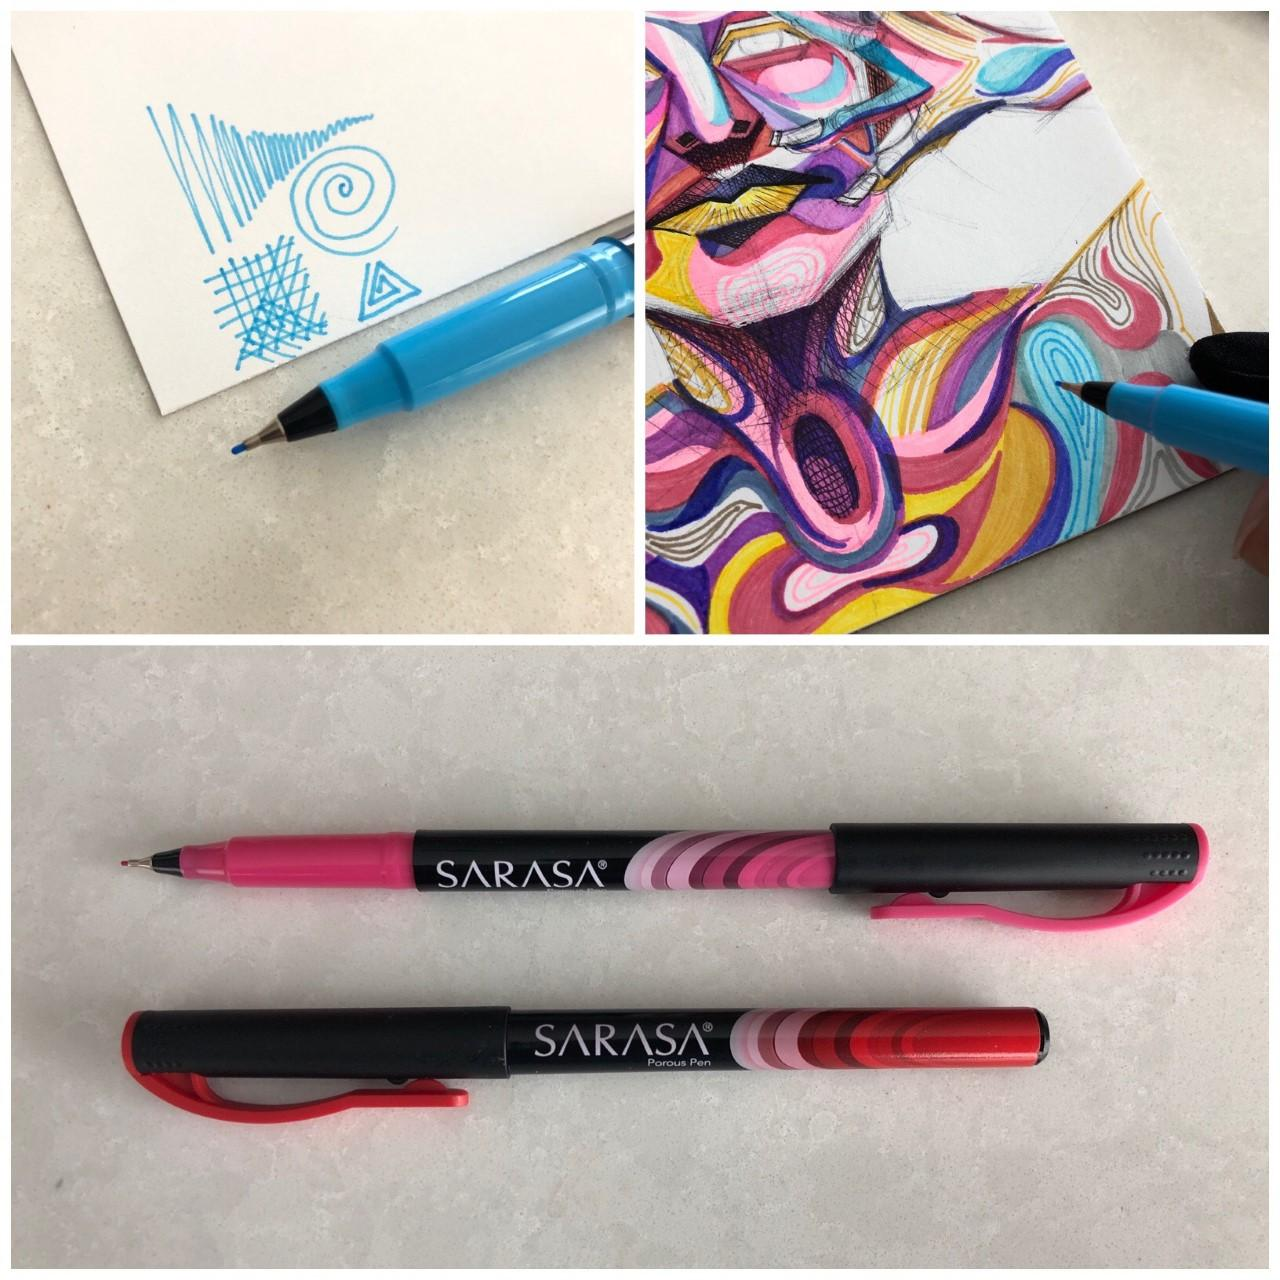 Sarasa Fineliner pens